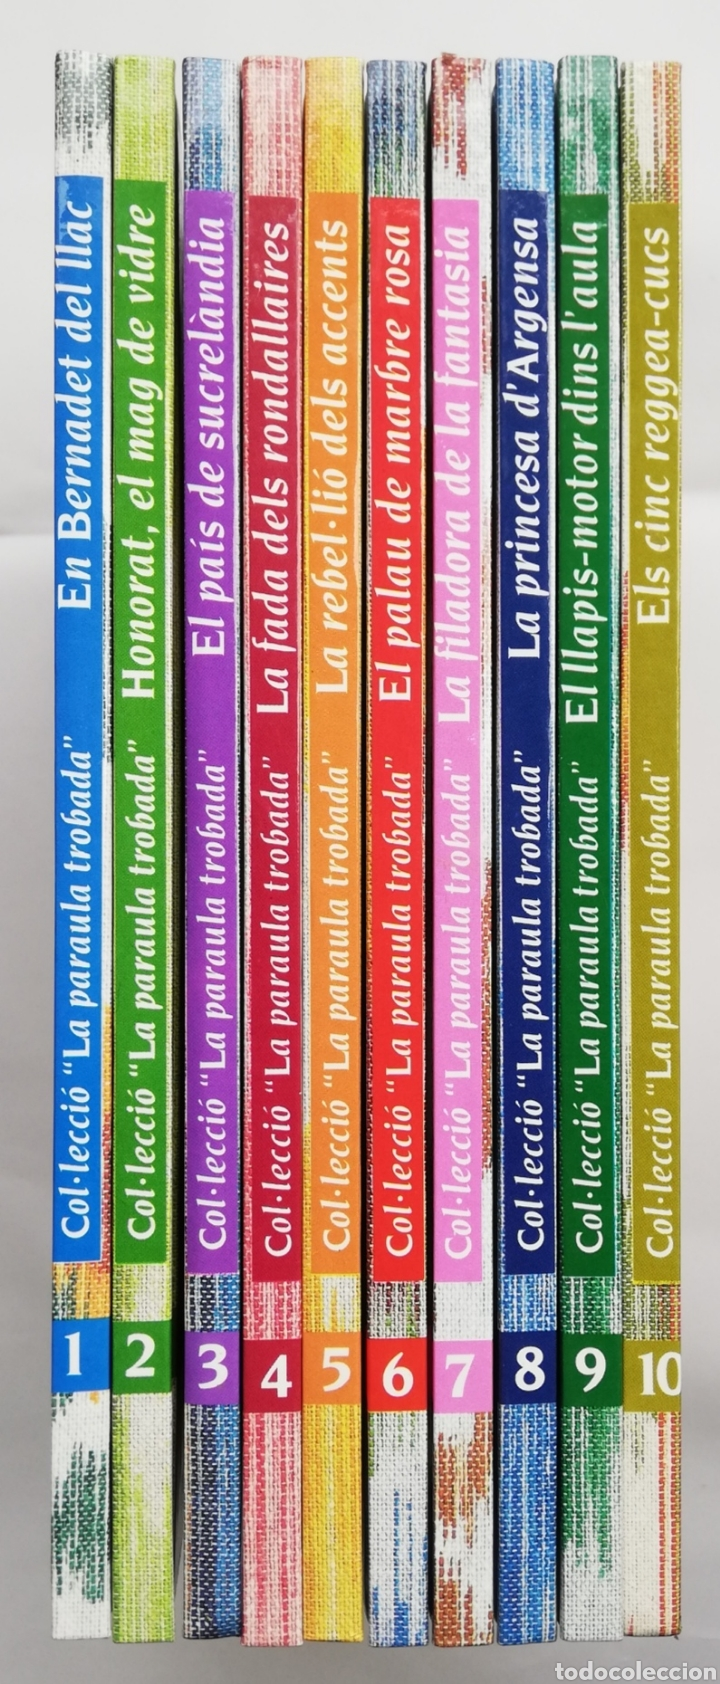 Libros de segunda mano: 10 CUENTOS EN CATALÁN - 1989 - CATALINA Mª SALA - ILU. DE FCA. SELLÉS - ED. ALPHA 3, MALLORCA - PJRB - Foto 4 - 215829917